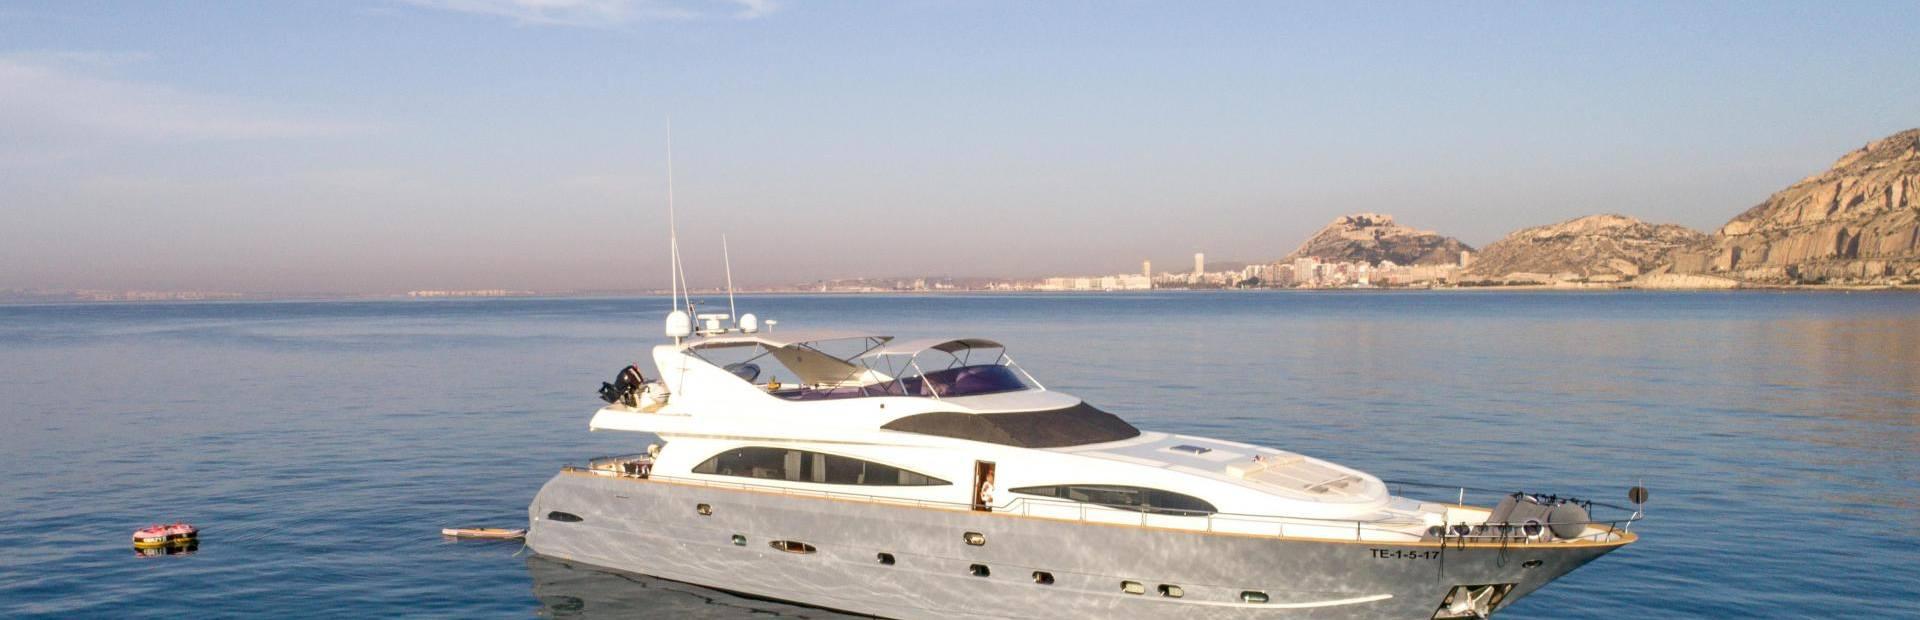 96 GLX Yacht Charter